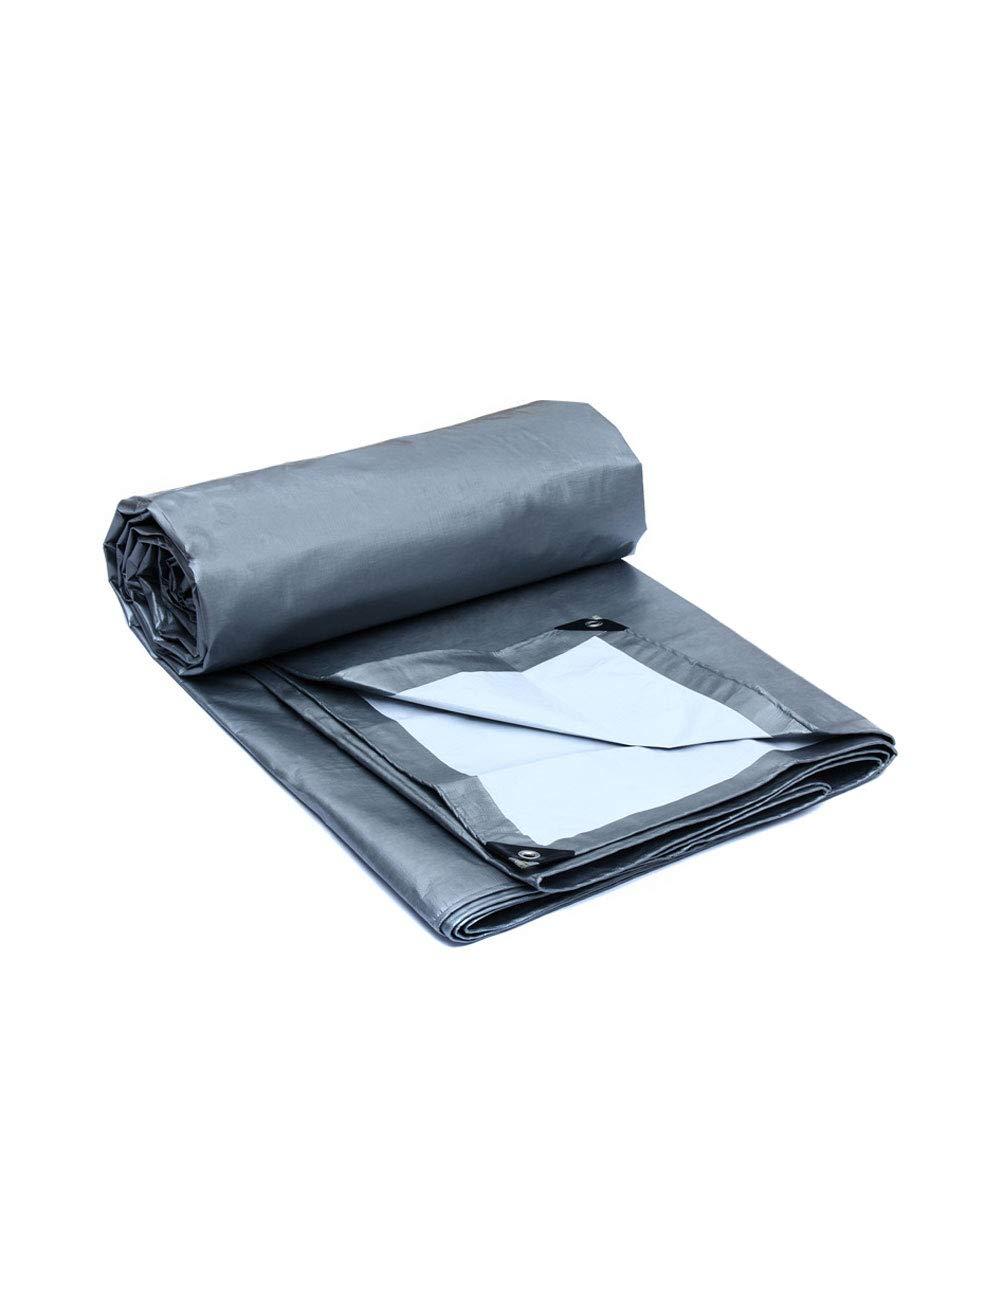 DLyng 防水ビーチテント抗UV日シェルター簡単なセットアップ家族のキャンプテント屋根、家具、ペット、ボート、プール (Size : L:10m W:8m) L:10m W:8m  B07HF49163